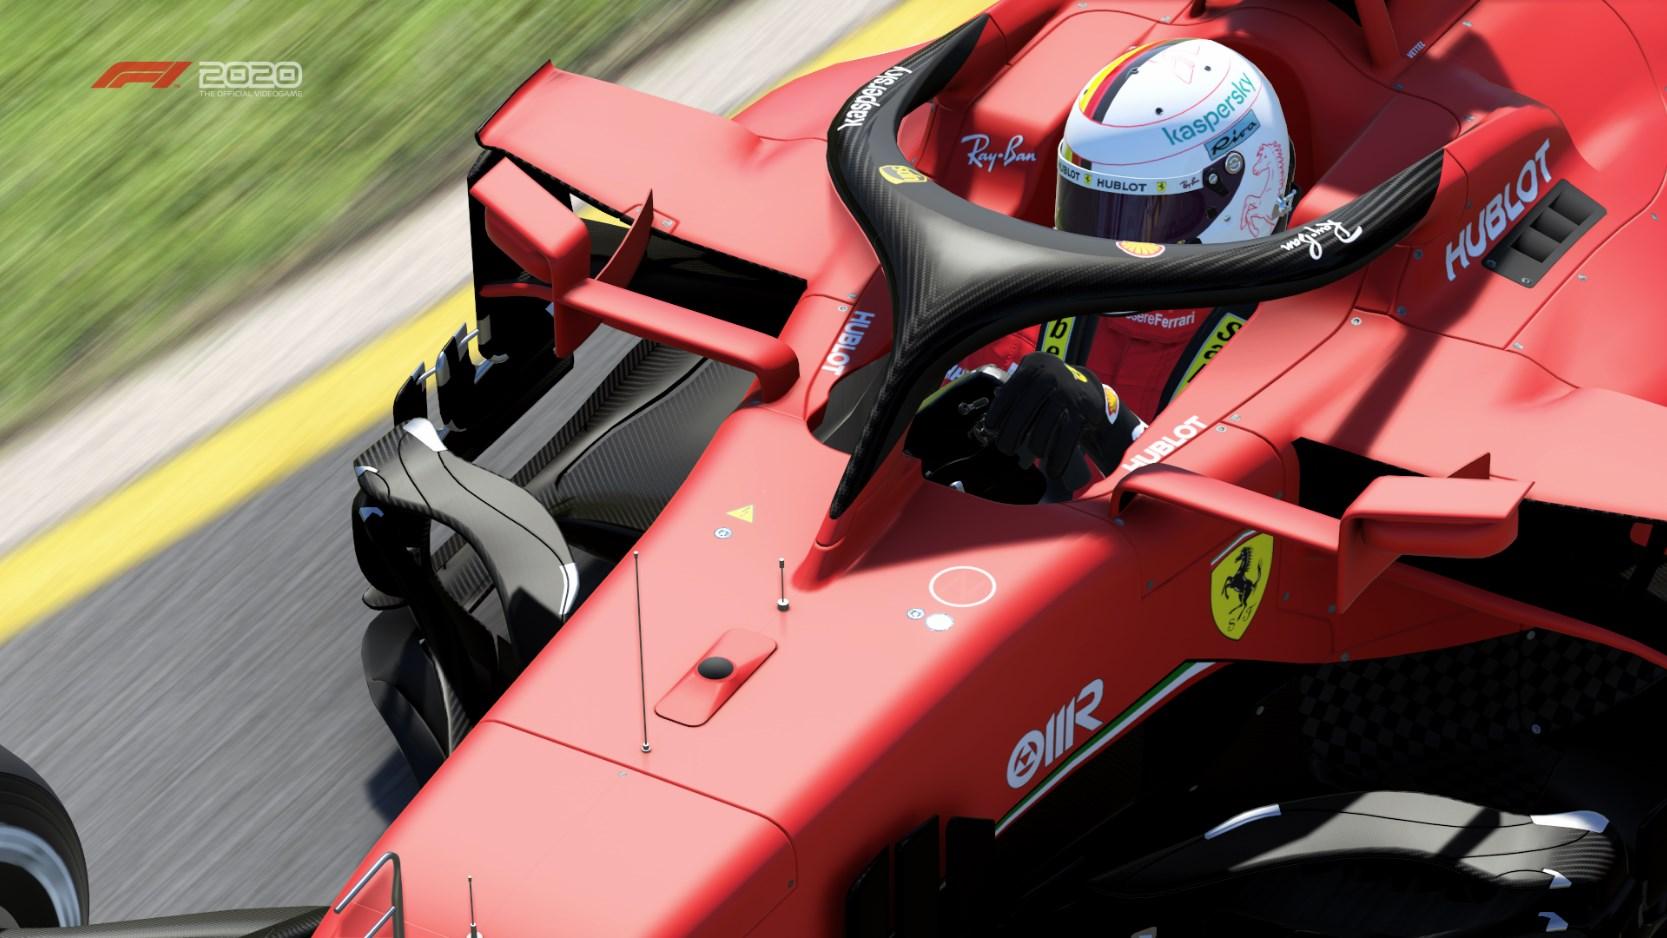 F1 2020 Weichai Power And Riva Yachts Be Gone Ferrari Racedepartment